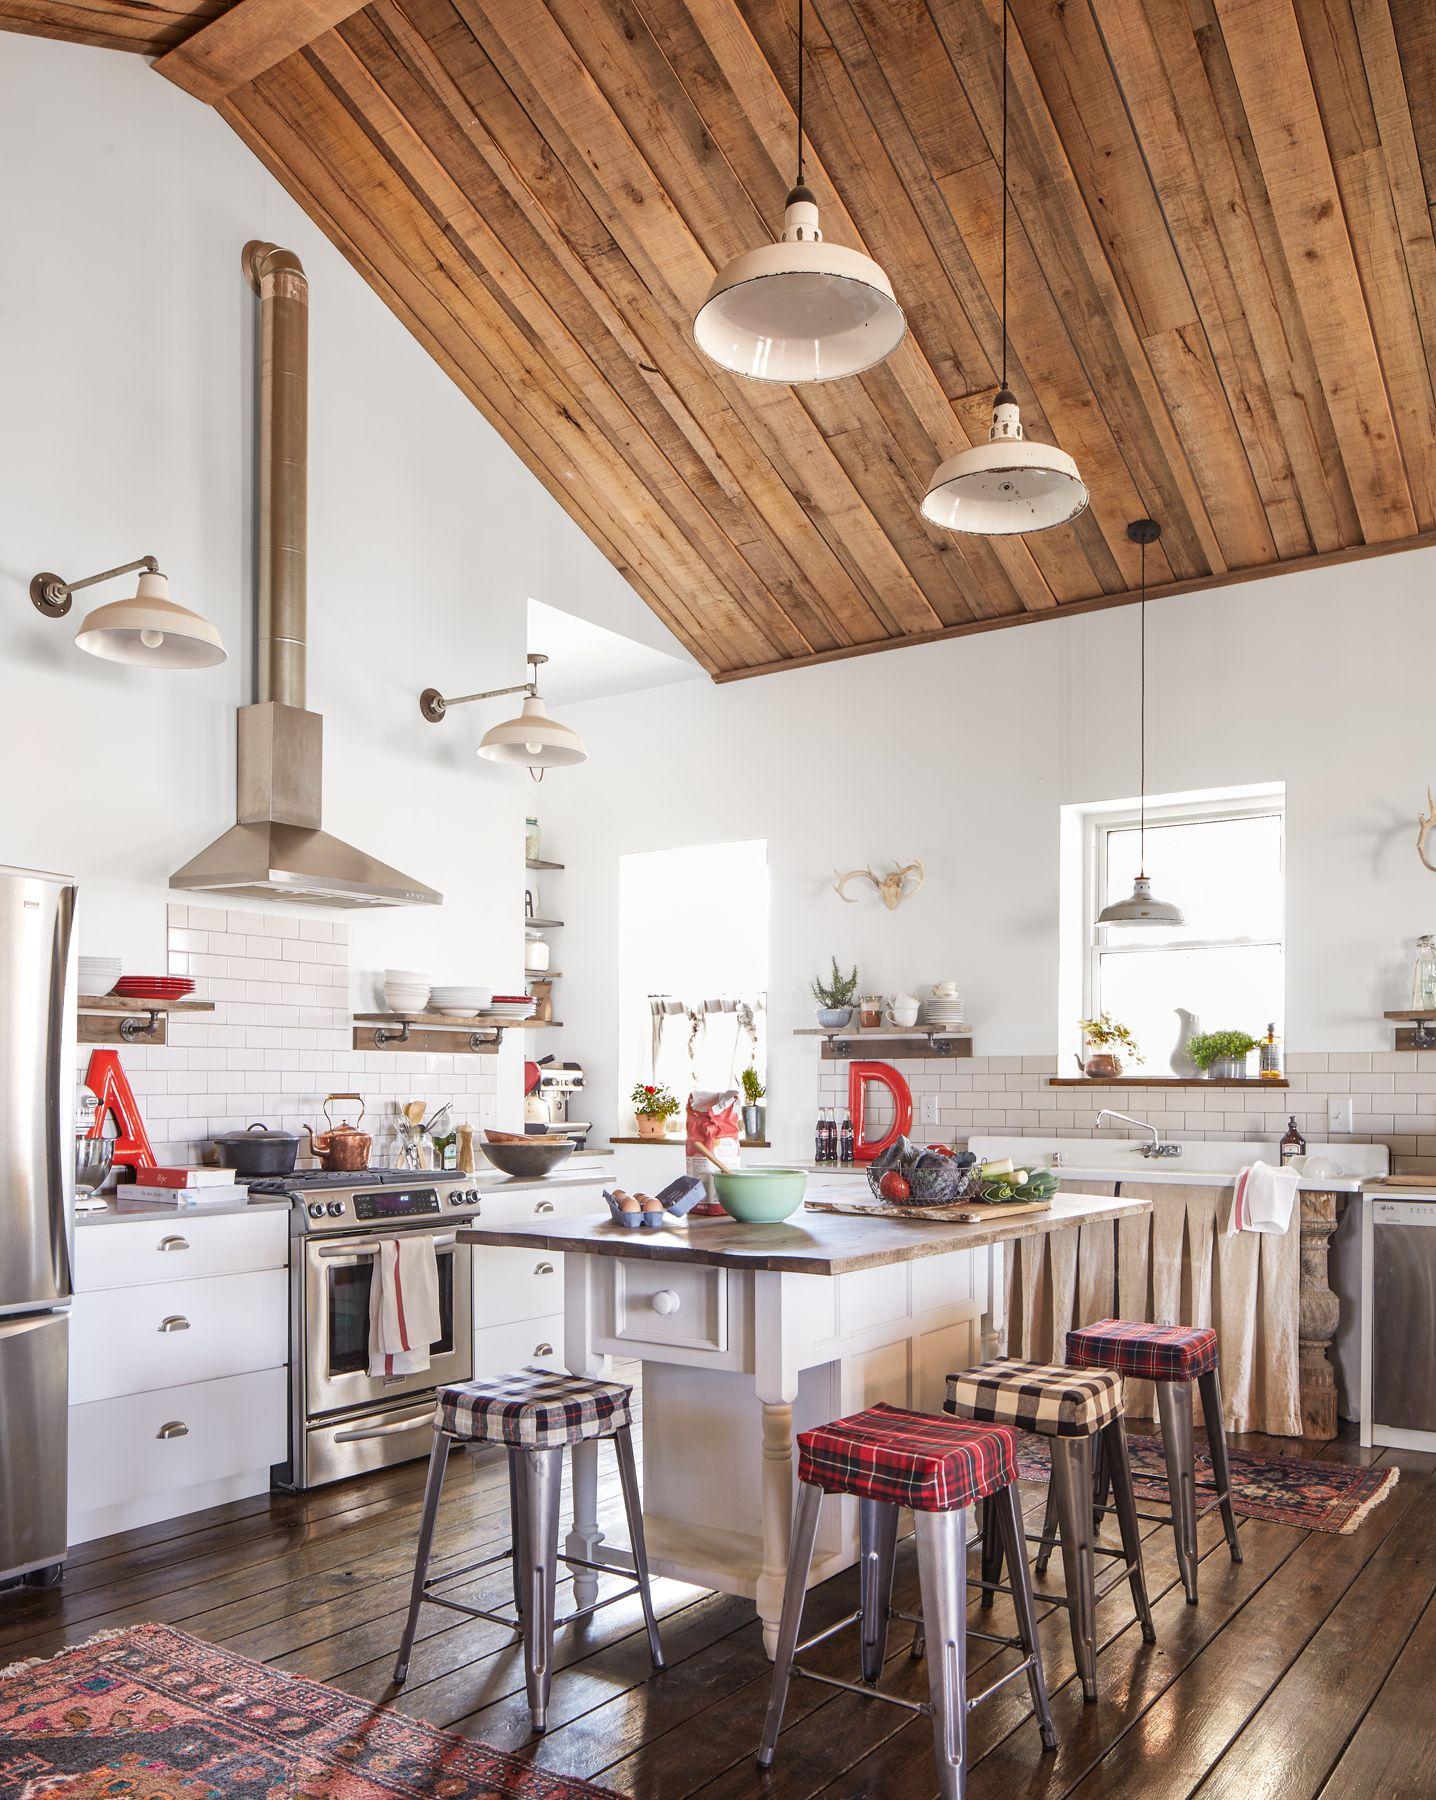 Darryl and Annie McCreary Cabin Decorating Ideas - Rustic Cabin Decor